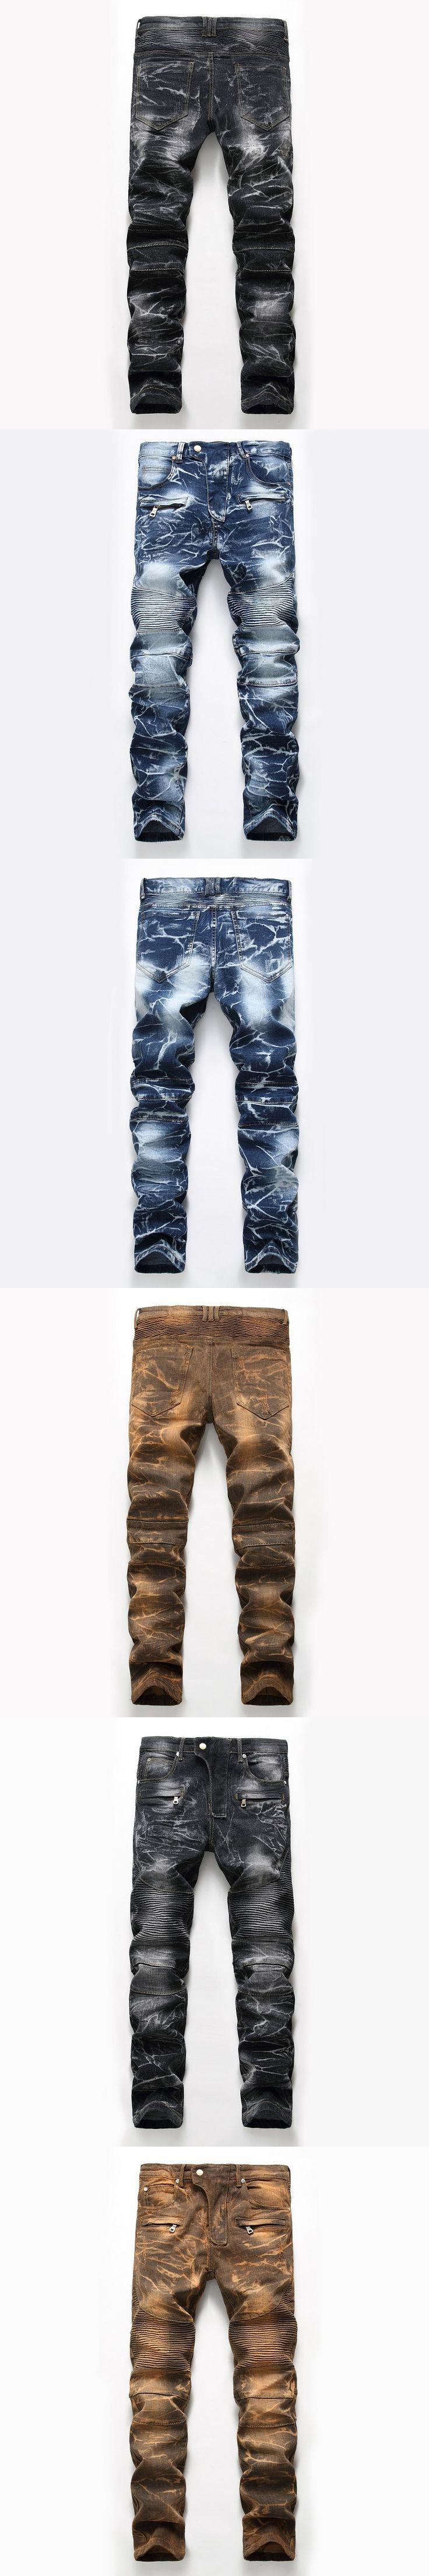 Dropshipping Biker Jeans Men Motorcycle Pants Slim Fit Moto Jean Trousers For Male Hi-Street Straight Pleated Gold Denim Pants